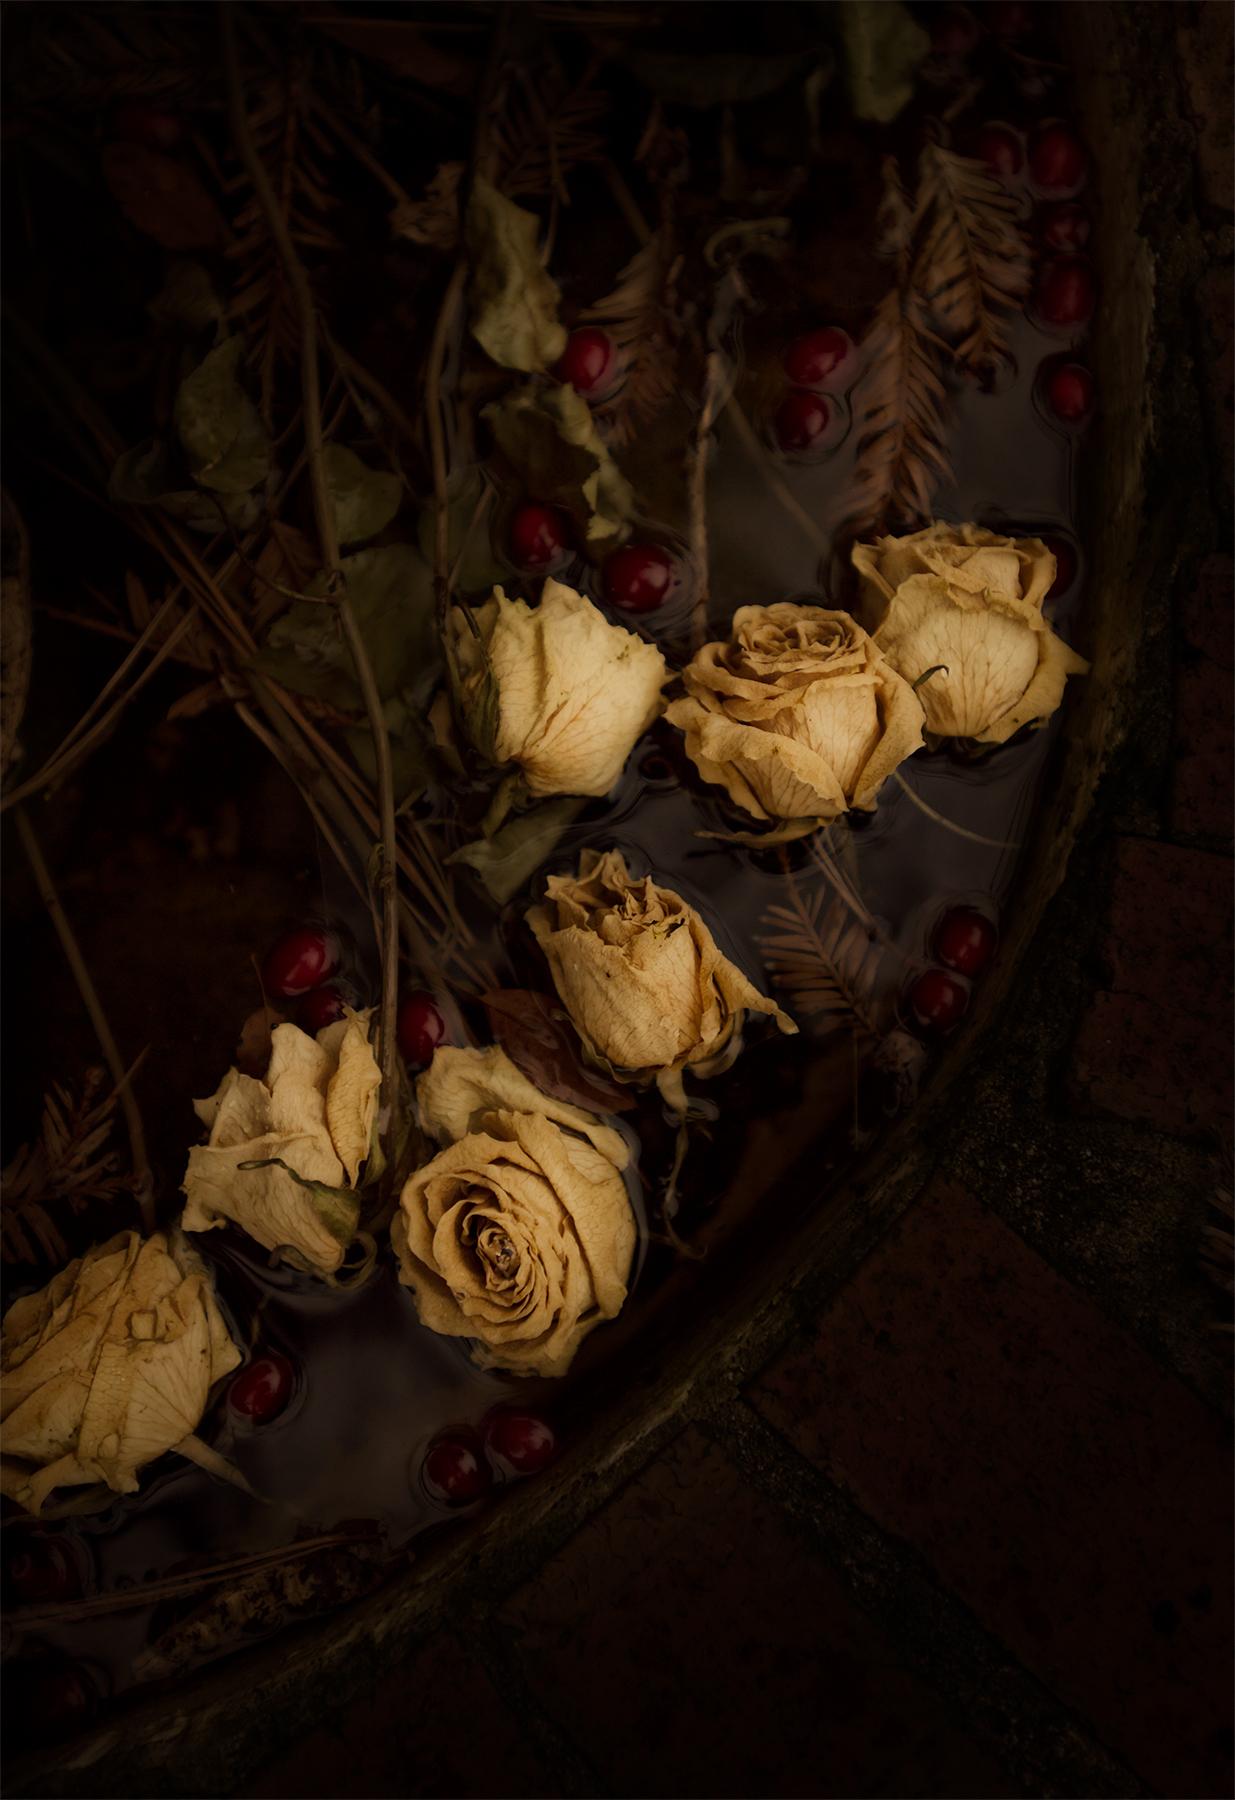 Roses and Cranberries in Bob's fountain, Virginia Beach, Va.